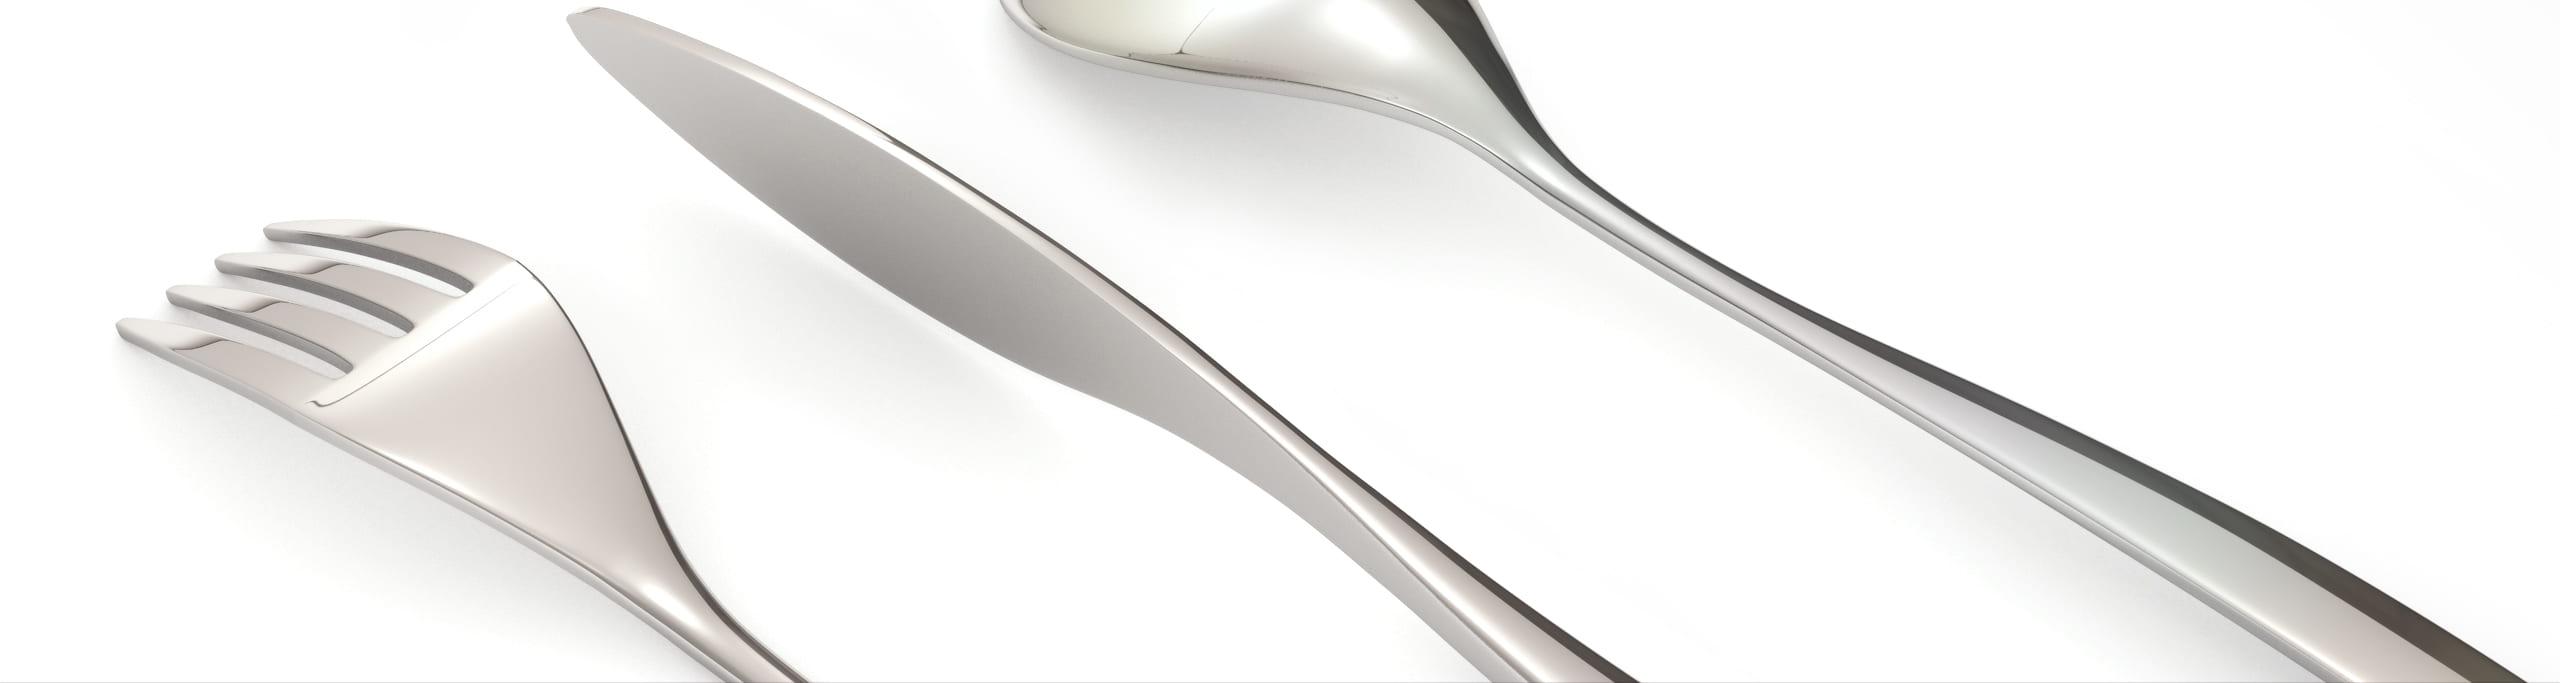 Hanno Groen Joanna Boothman Design Creative Direction Amsterdam Cutlery design